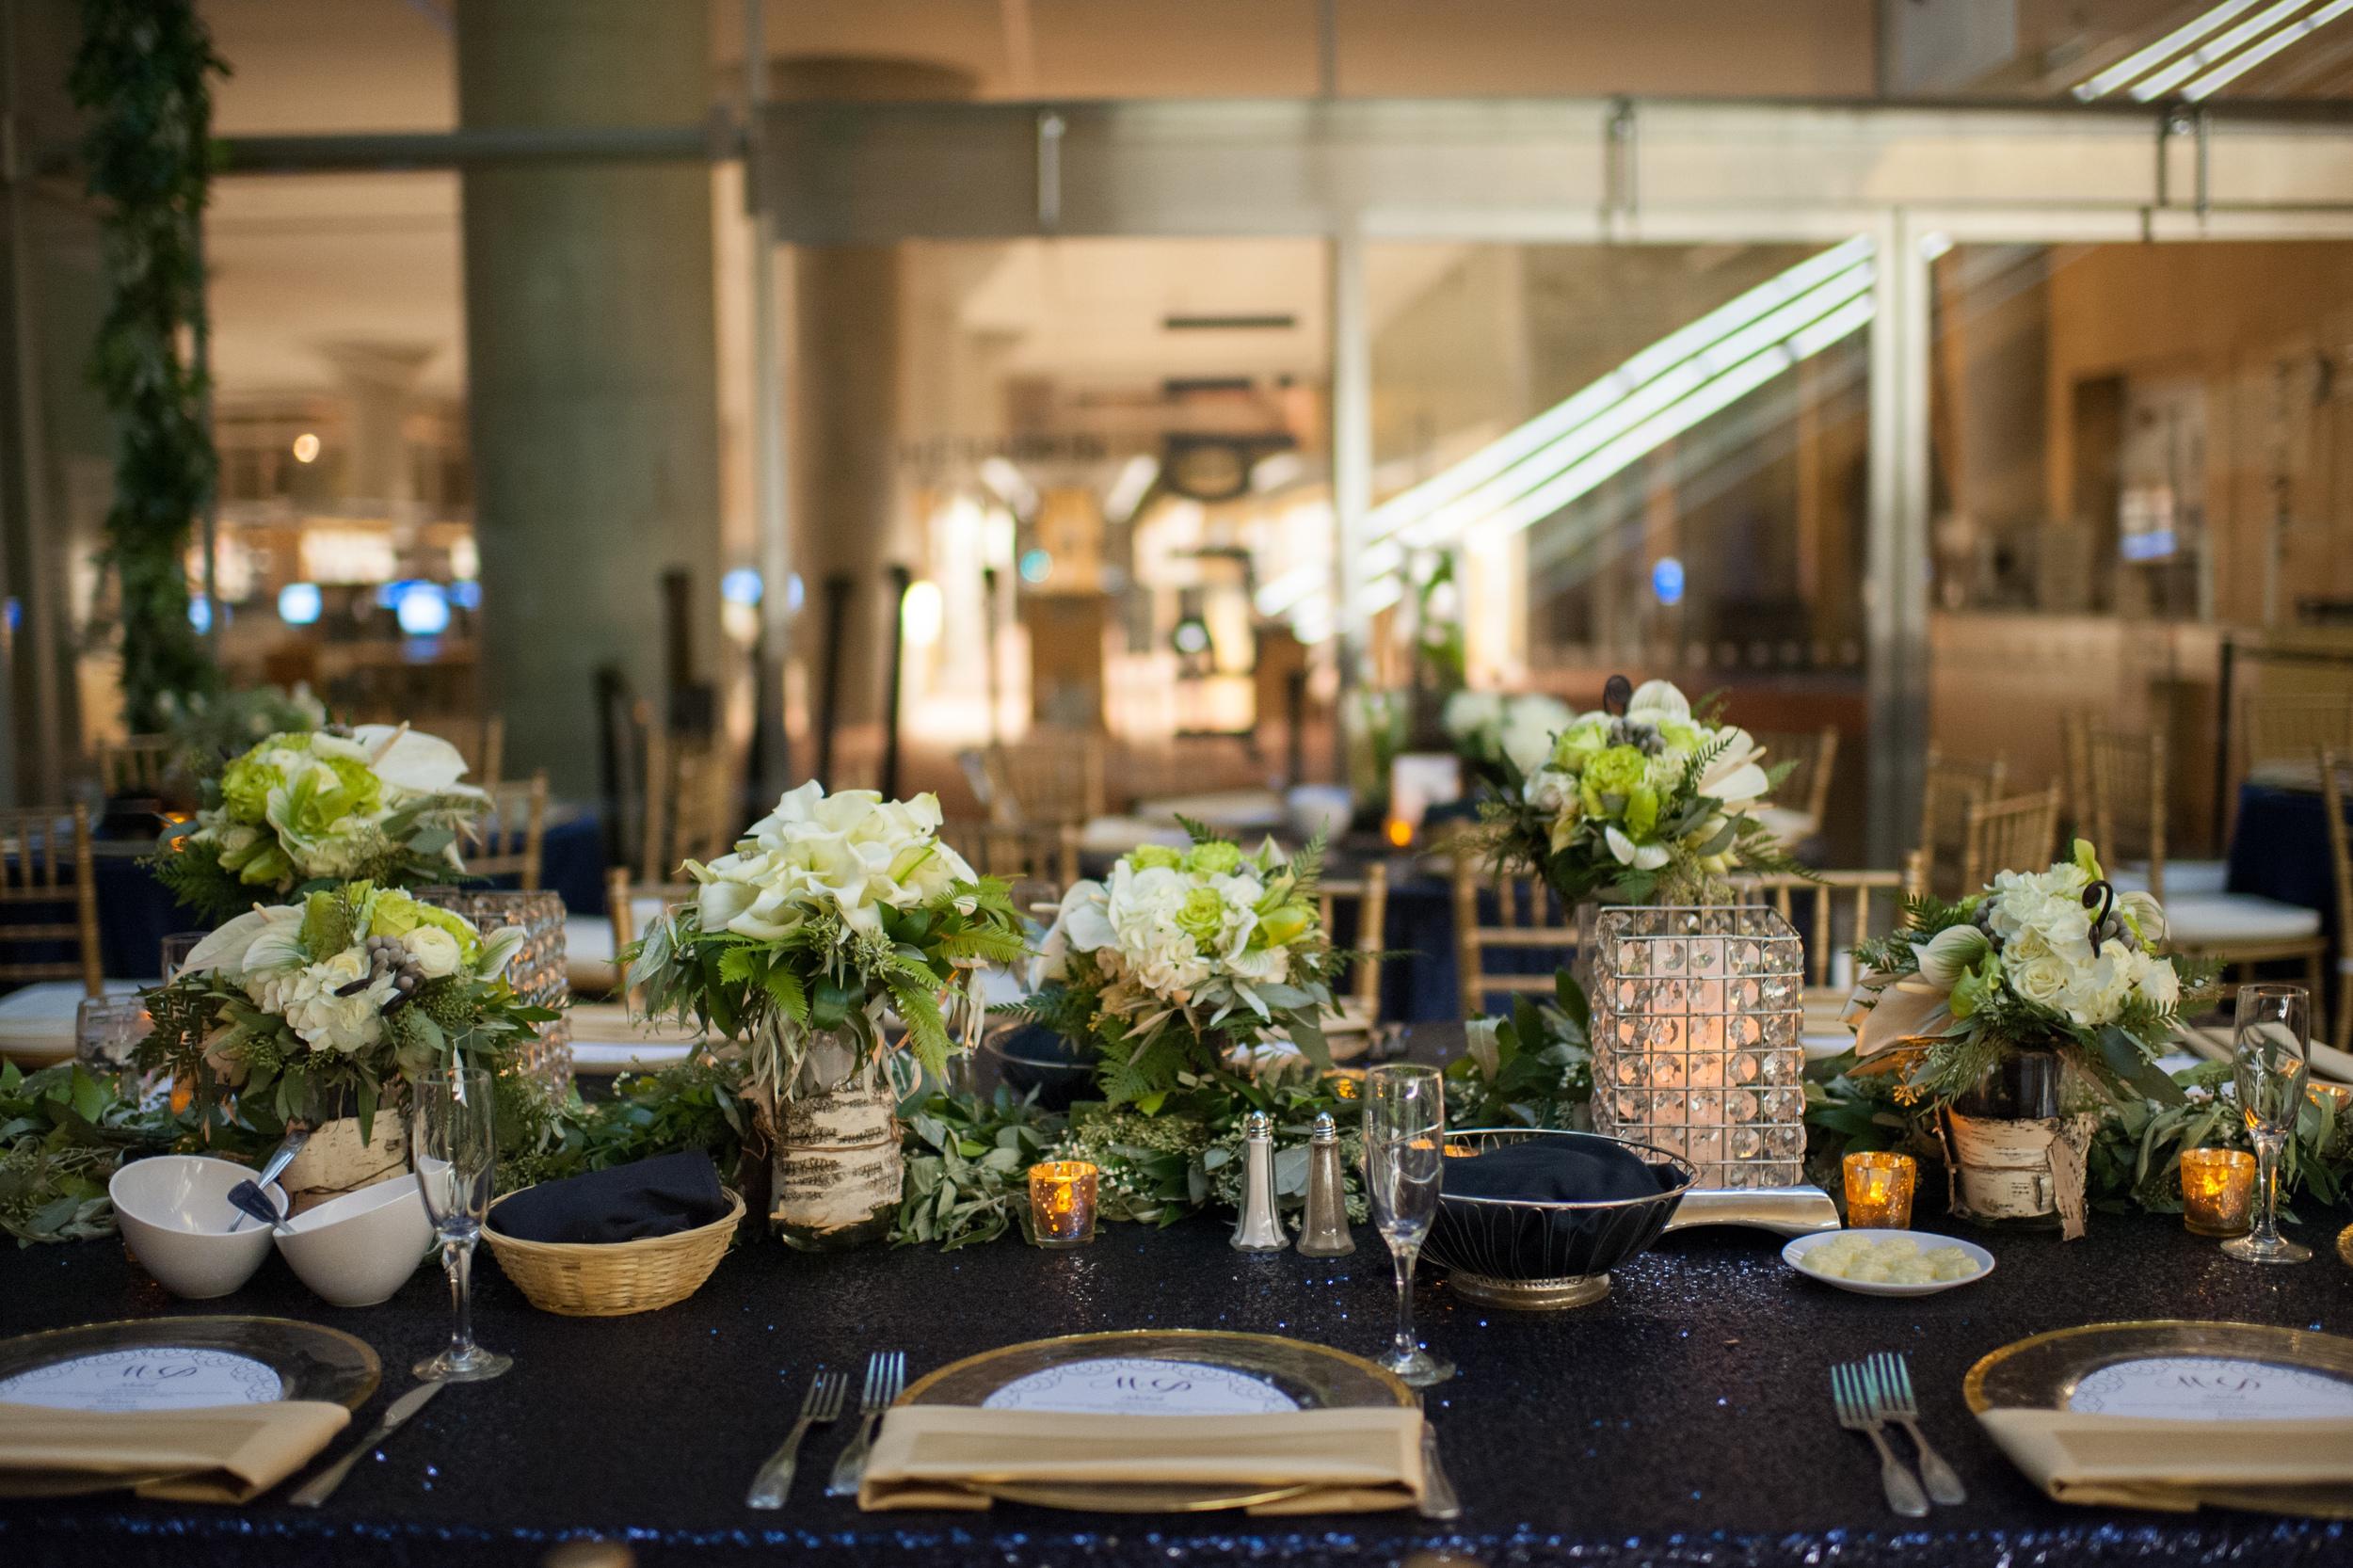 Acowsay_Cinema_MN_Wedding_Florals.jpg